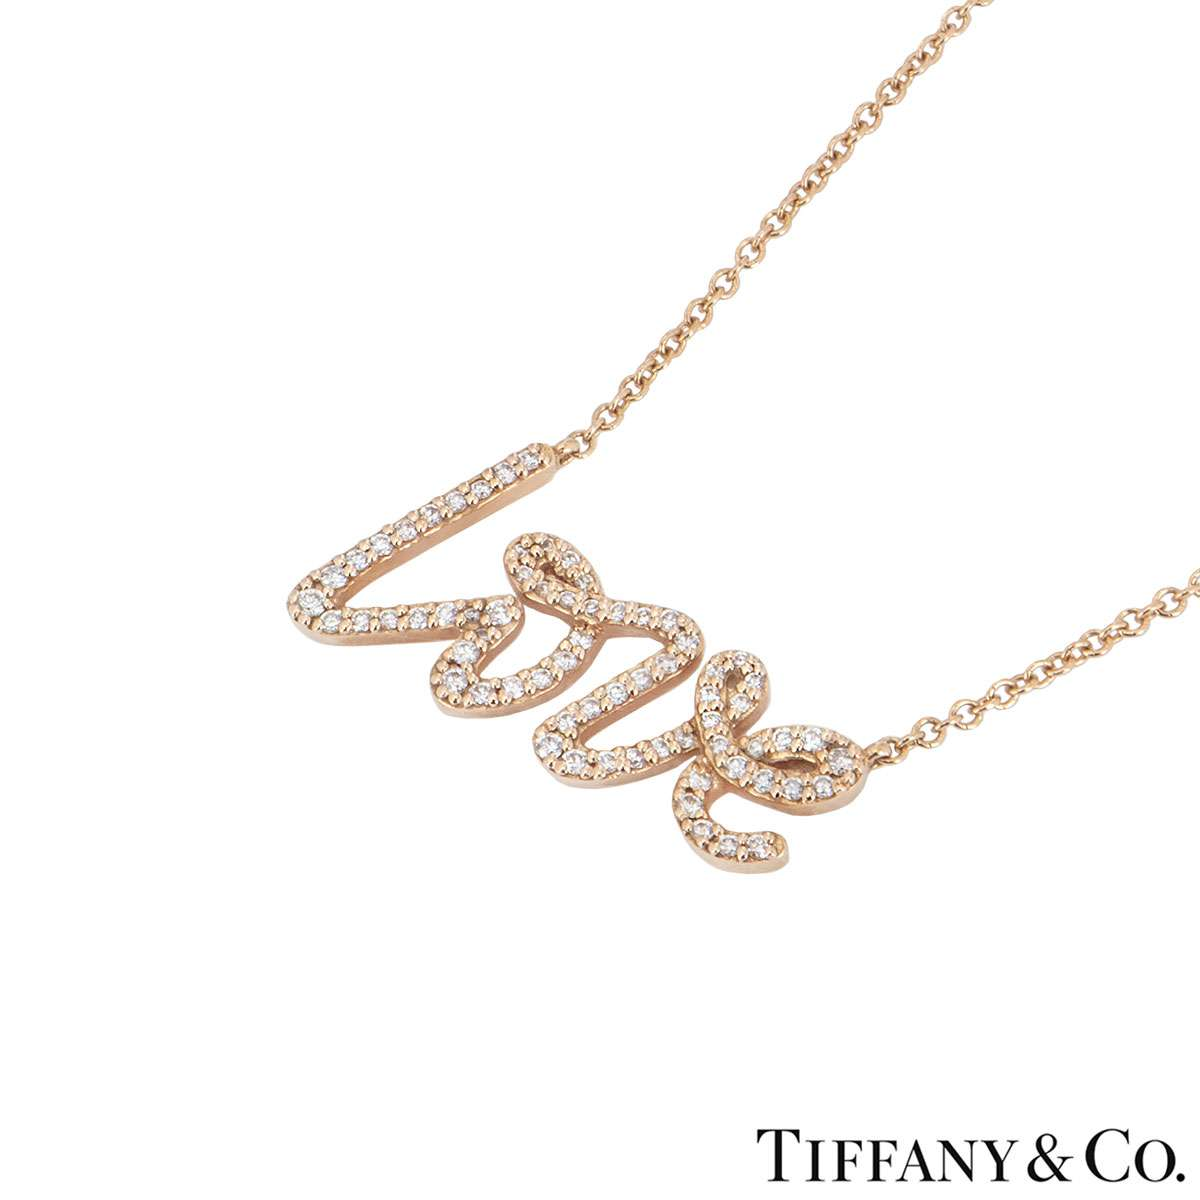 Tiffany & Co. Rose Gold Diamond Love Necklace